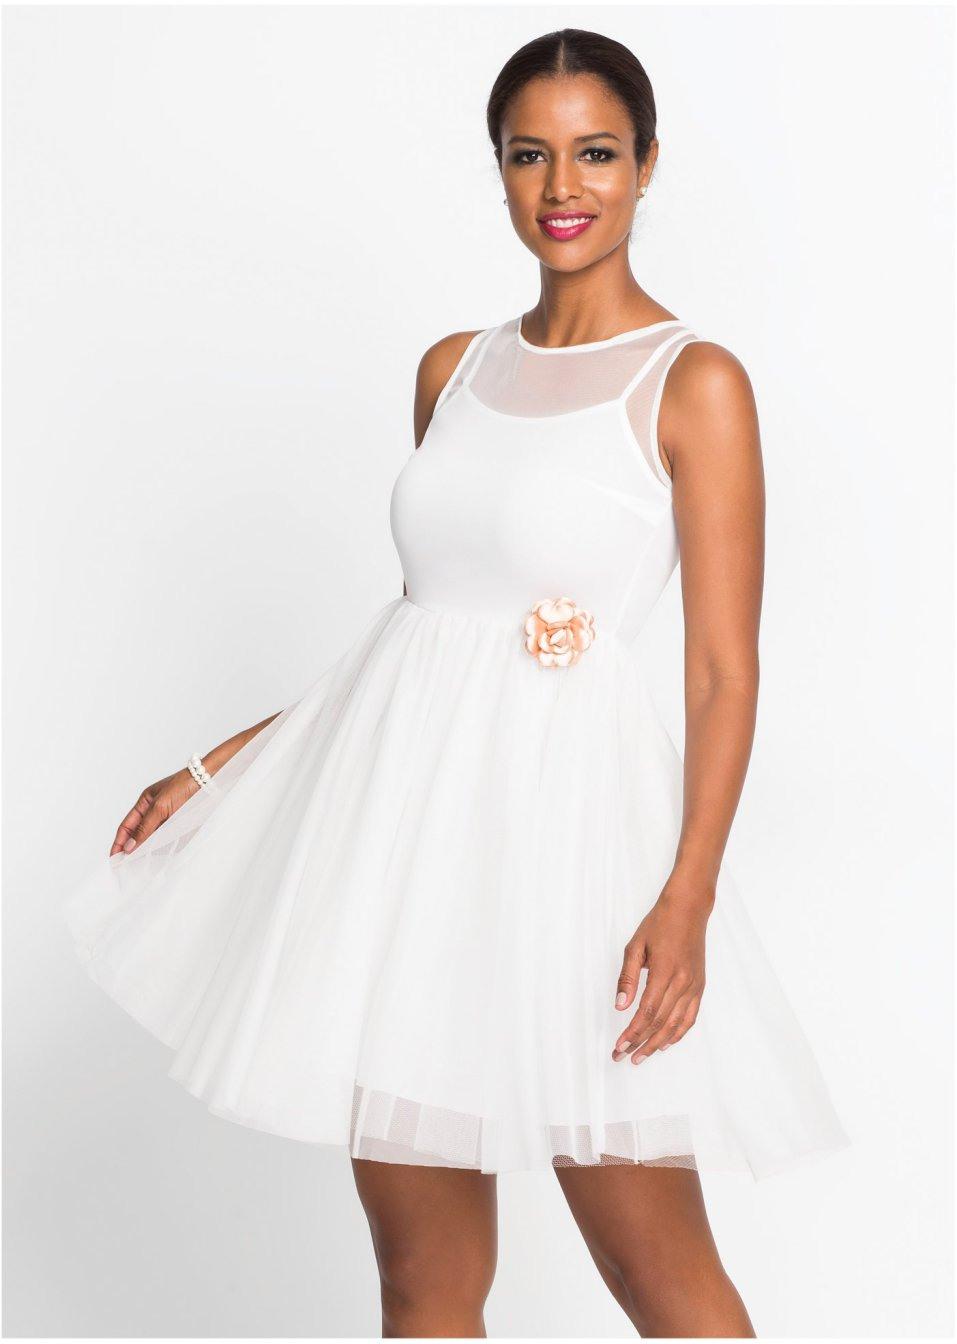 Luxus Bonprix De Kategorie Damen Mode Kleider Bilder